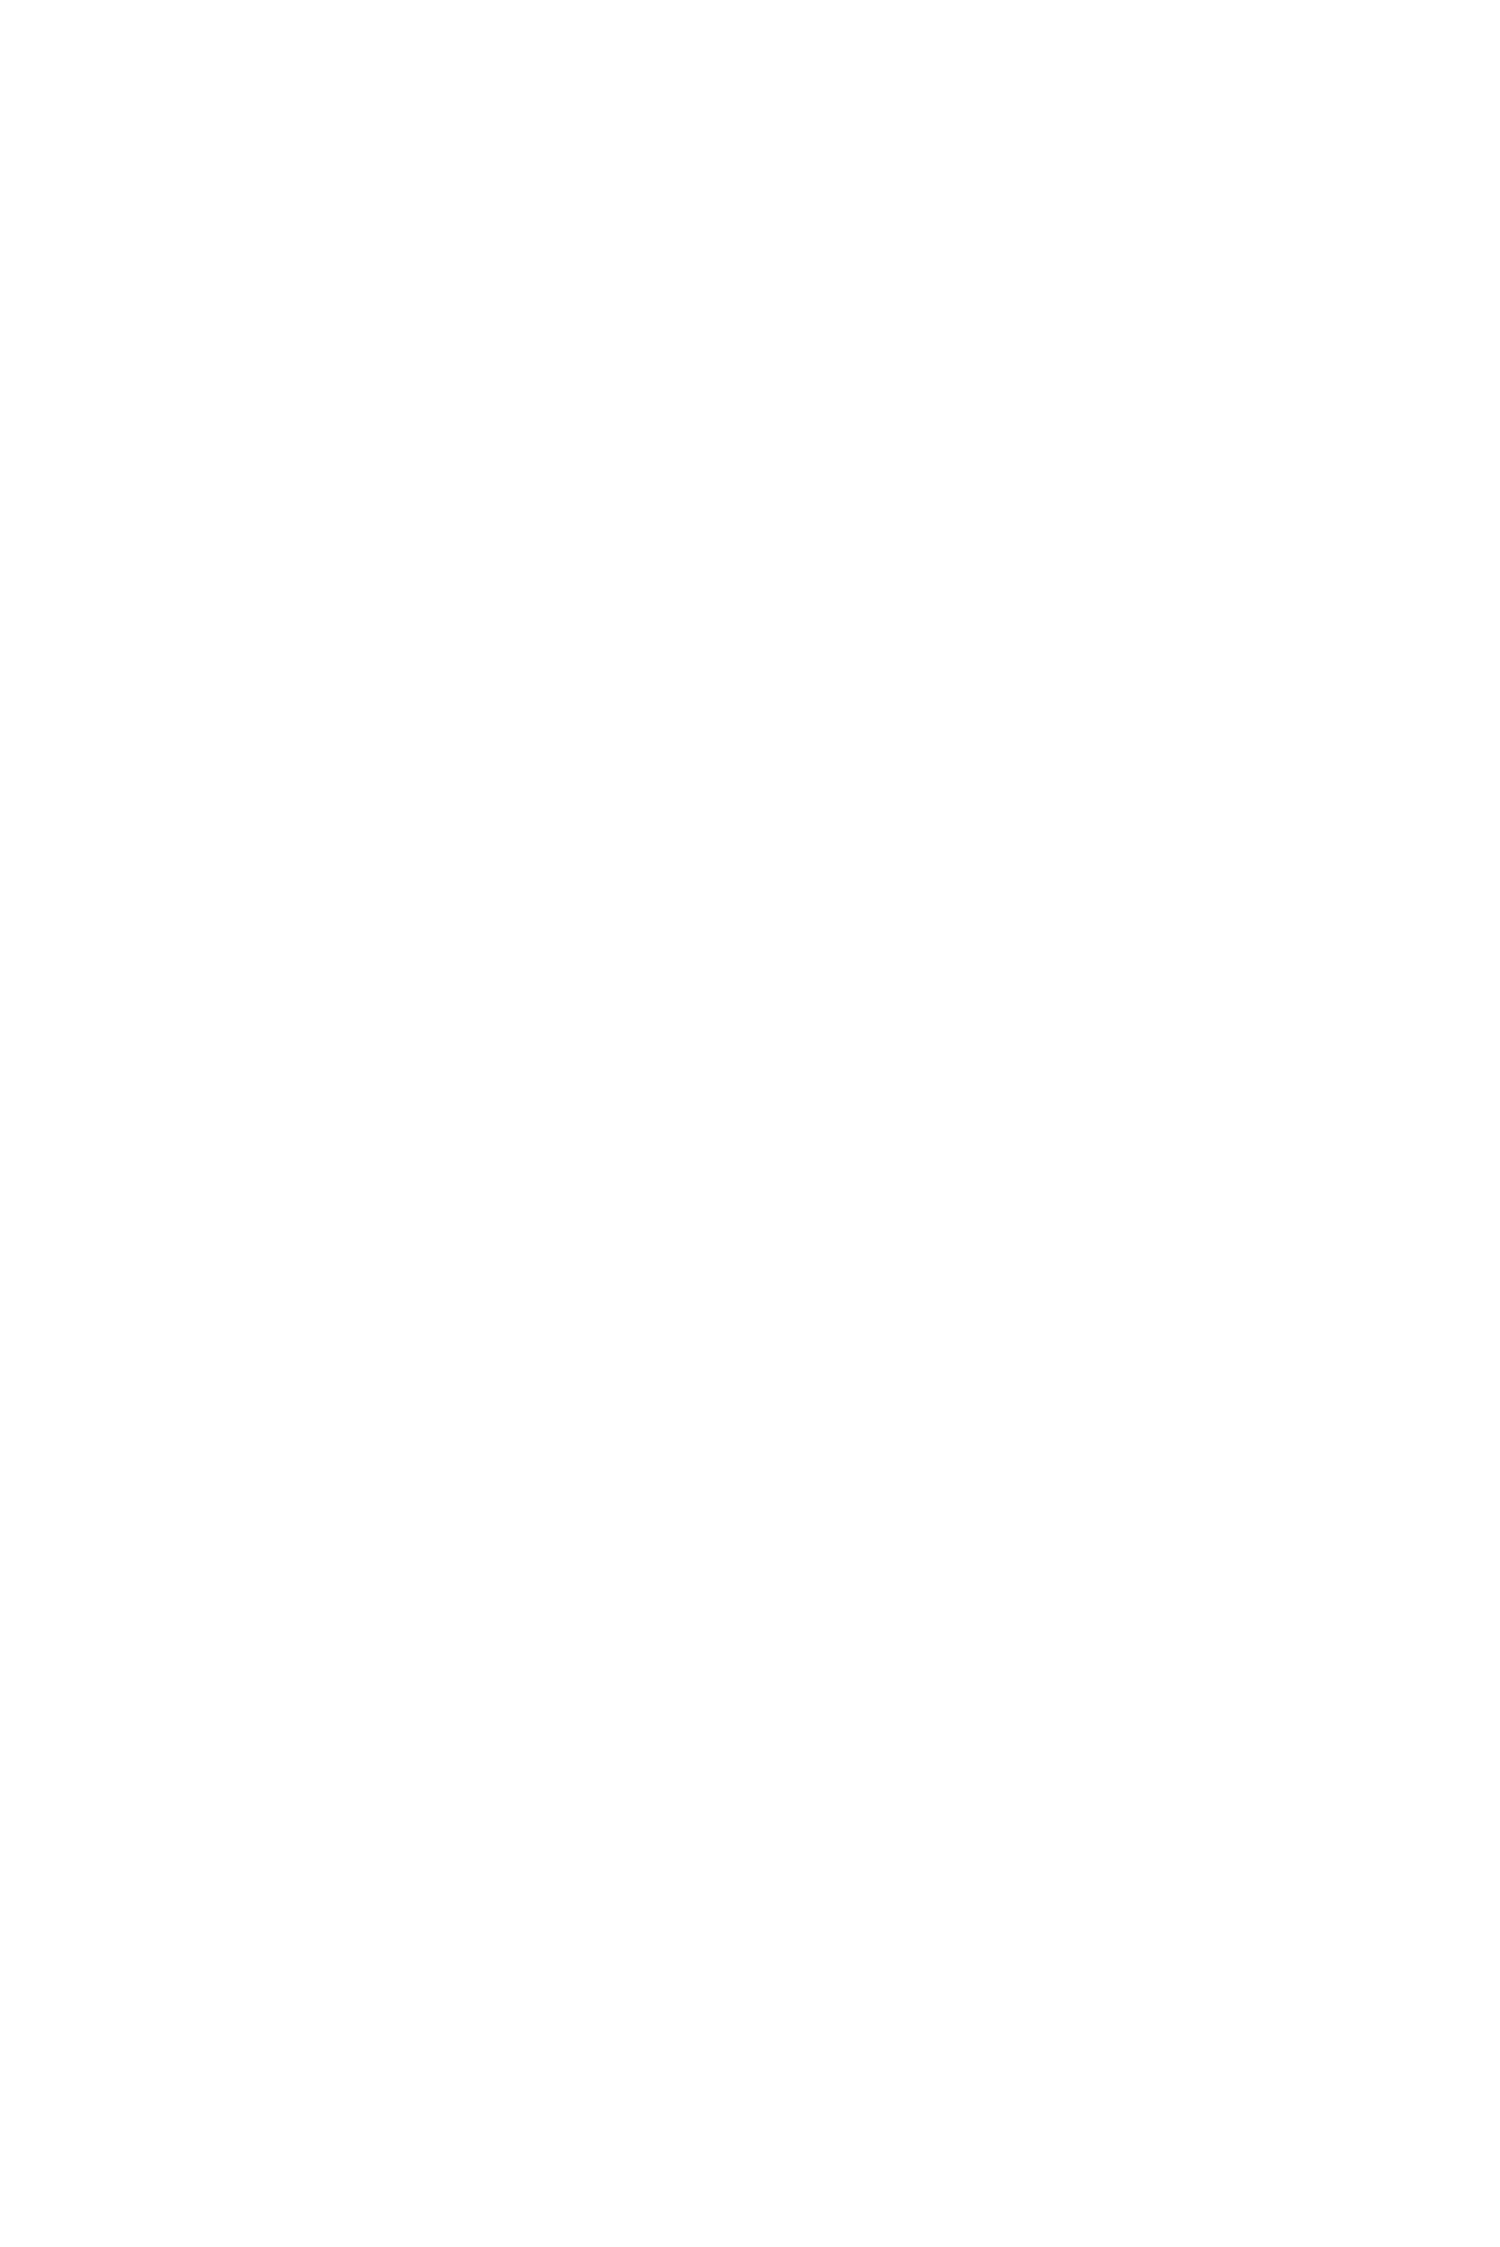 mvp_1637-1